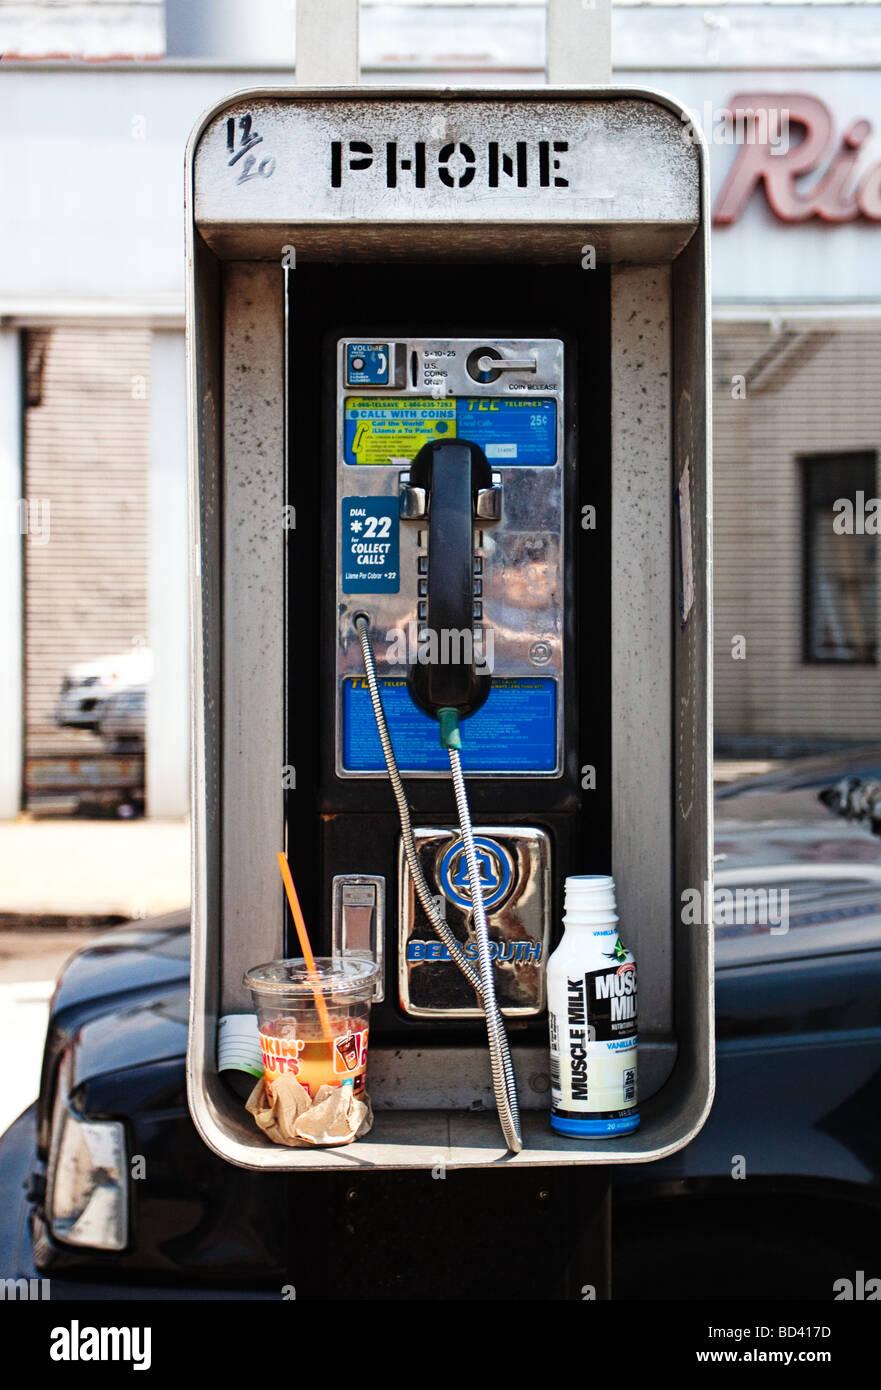 Phone box street with breakfast: coffee and milk. Public phone on Brooklyn street, New York City. - Stock Image